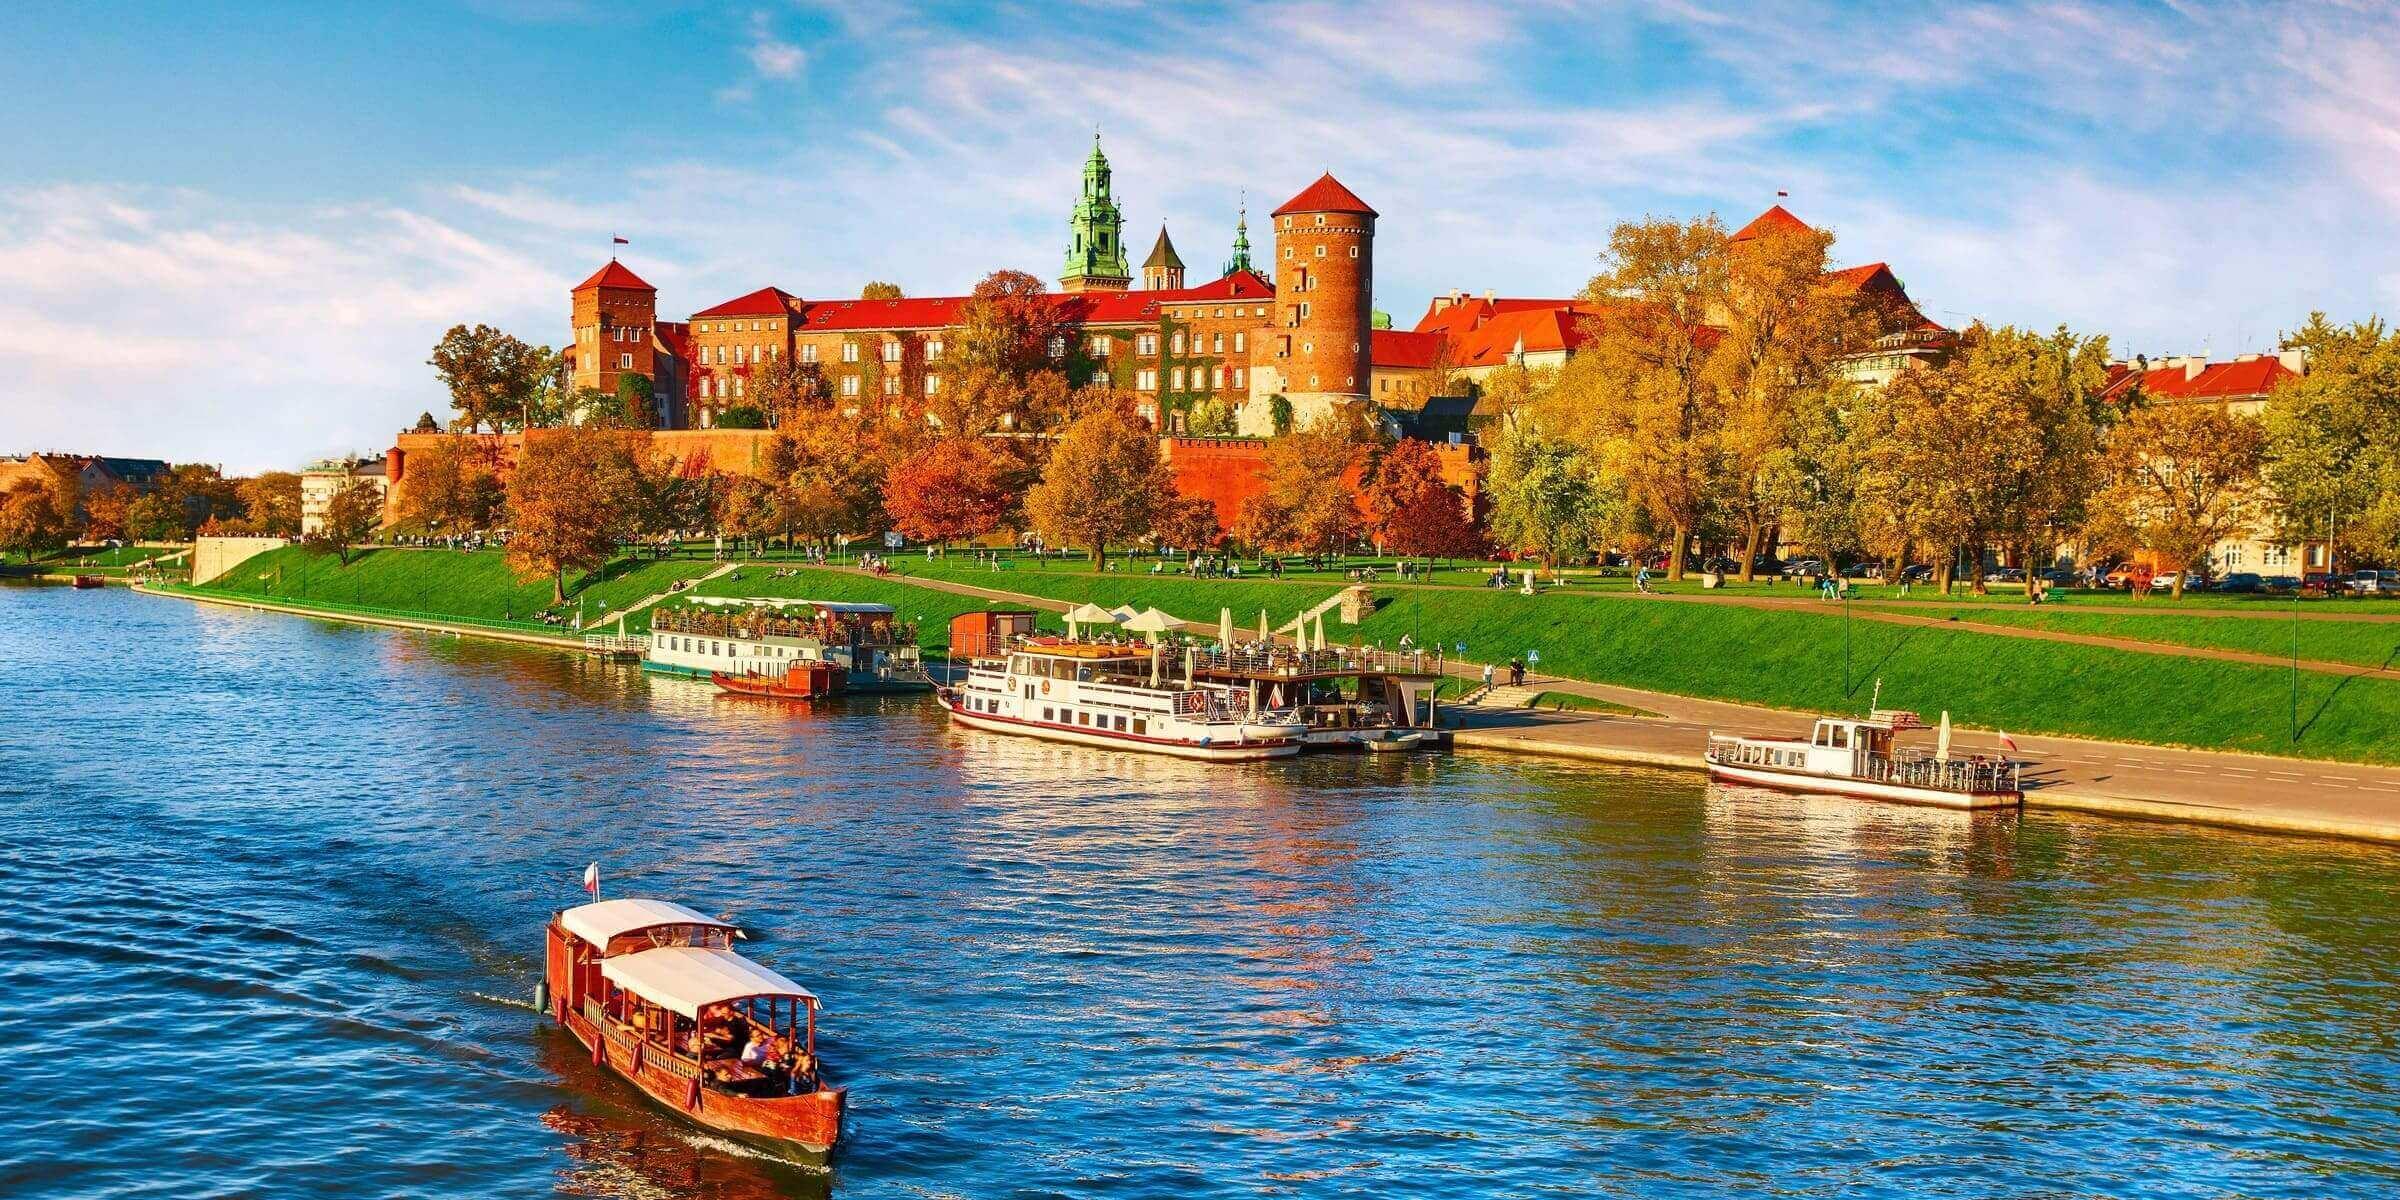 Singlereise nach Krakau - Wawel Castle